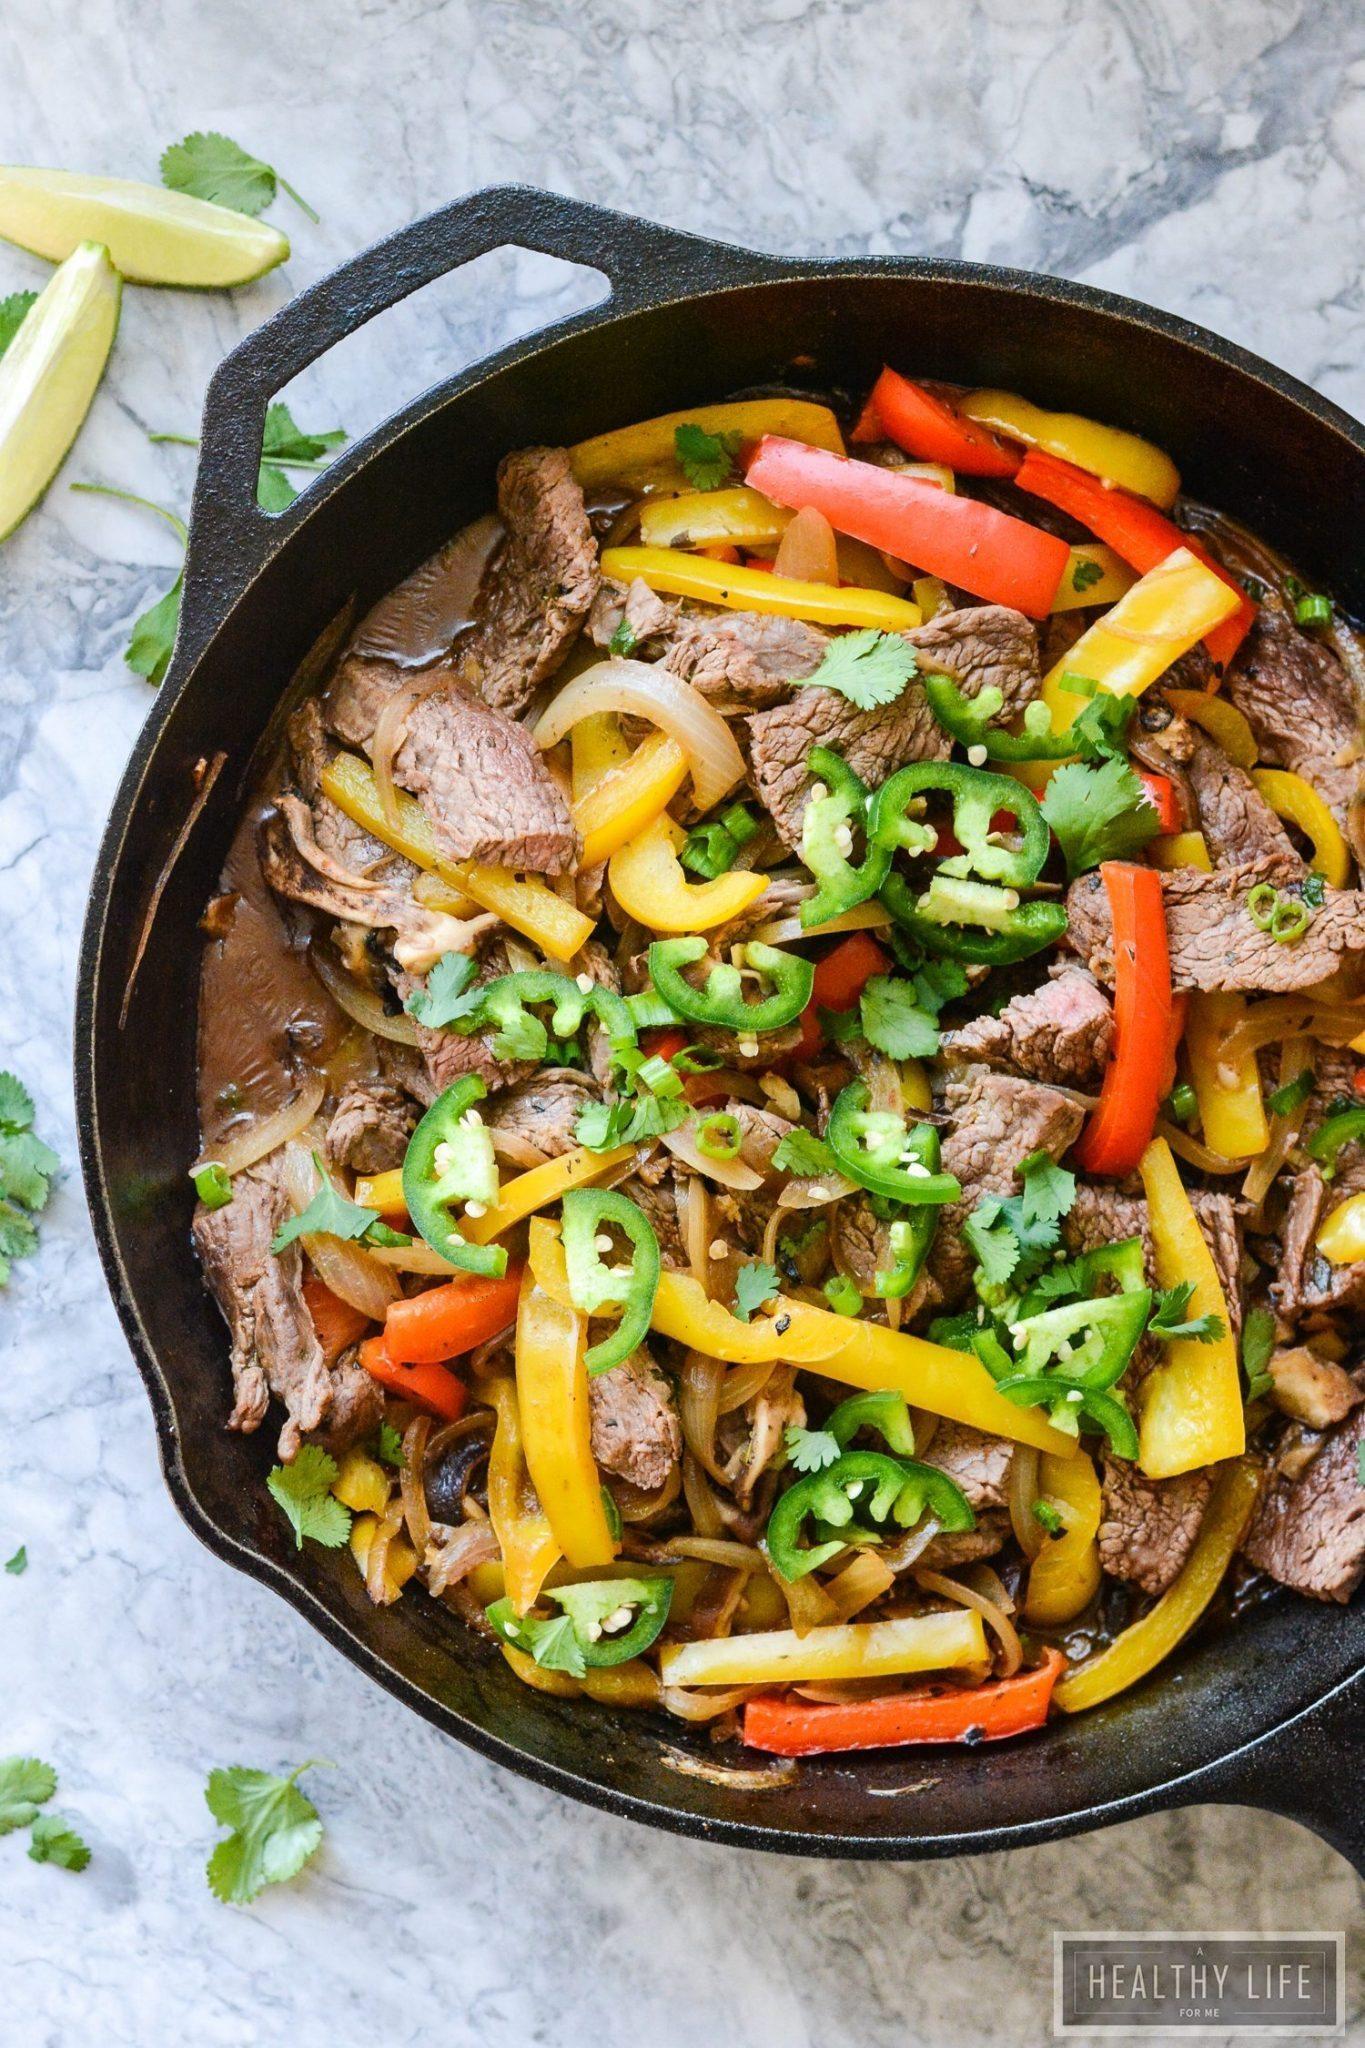 Paleo Skillet Beef Fajitas - A Healthy Life For Me